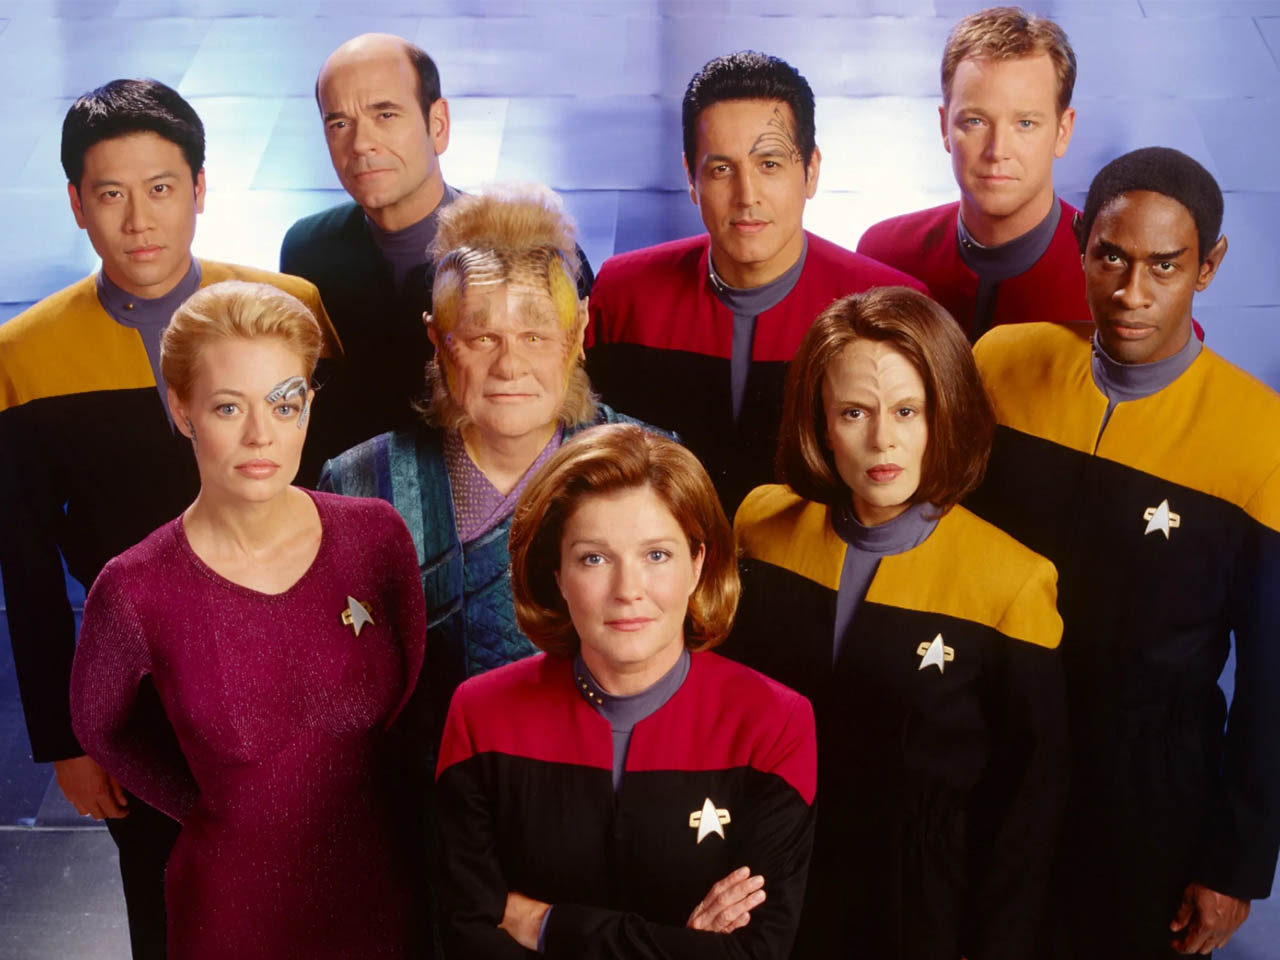 Star Trek - Voyager - Group Shot - 1280 - Featured - 01